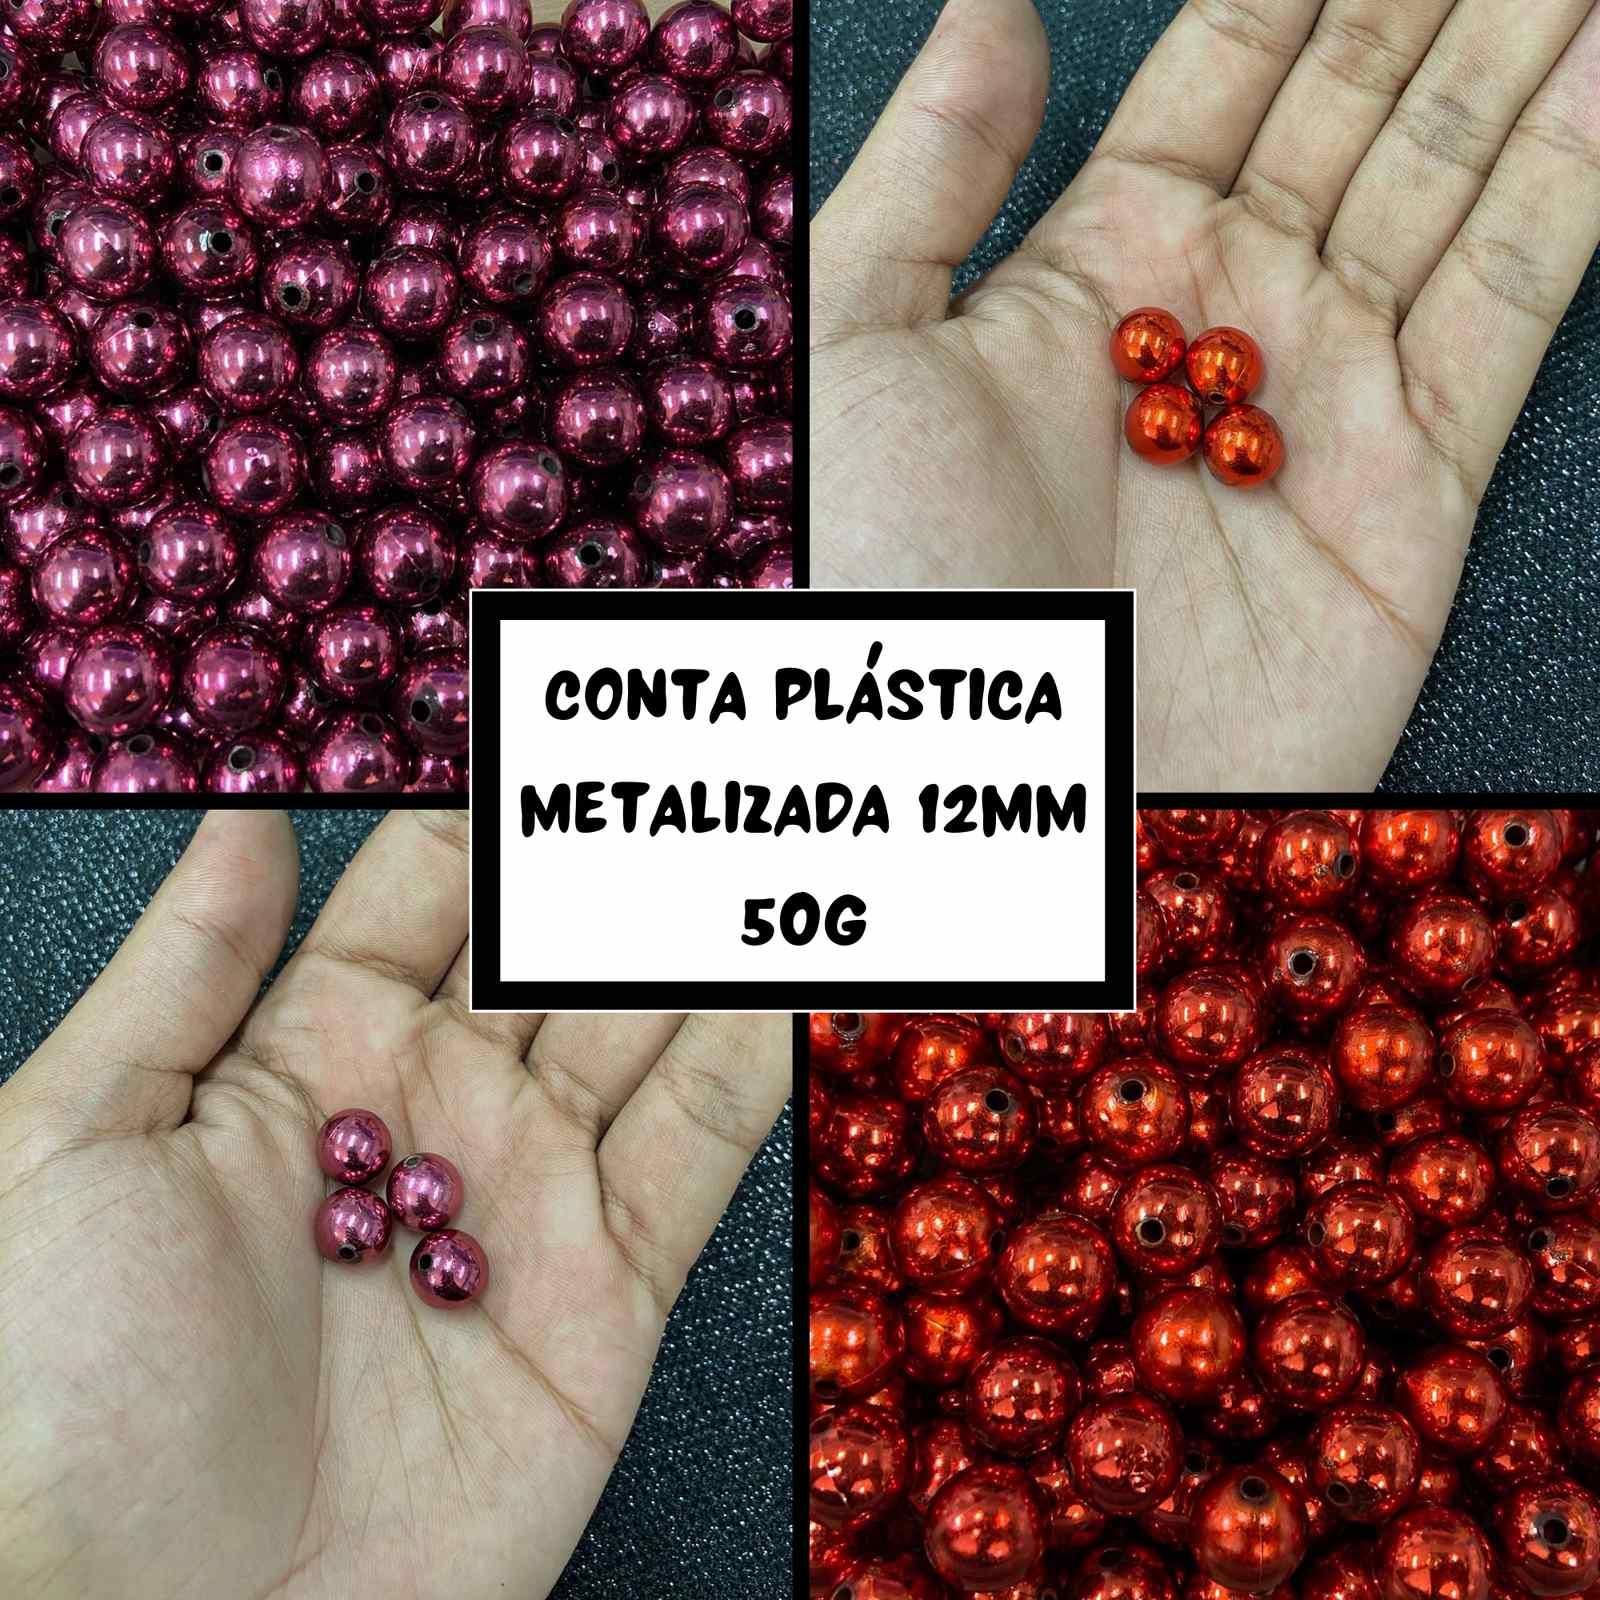 Conta Plástica Metalizada 12mm - 50g